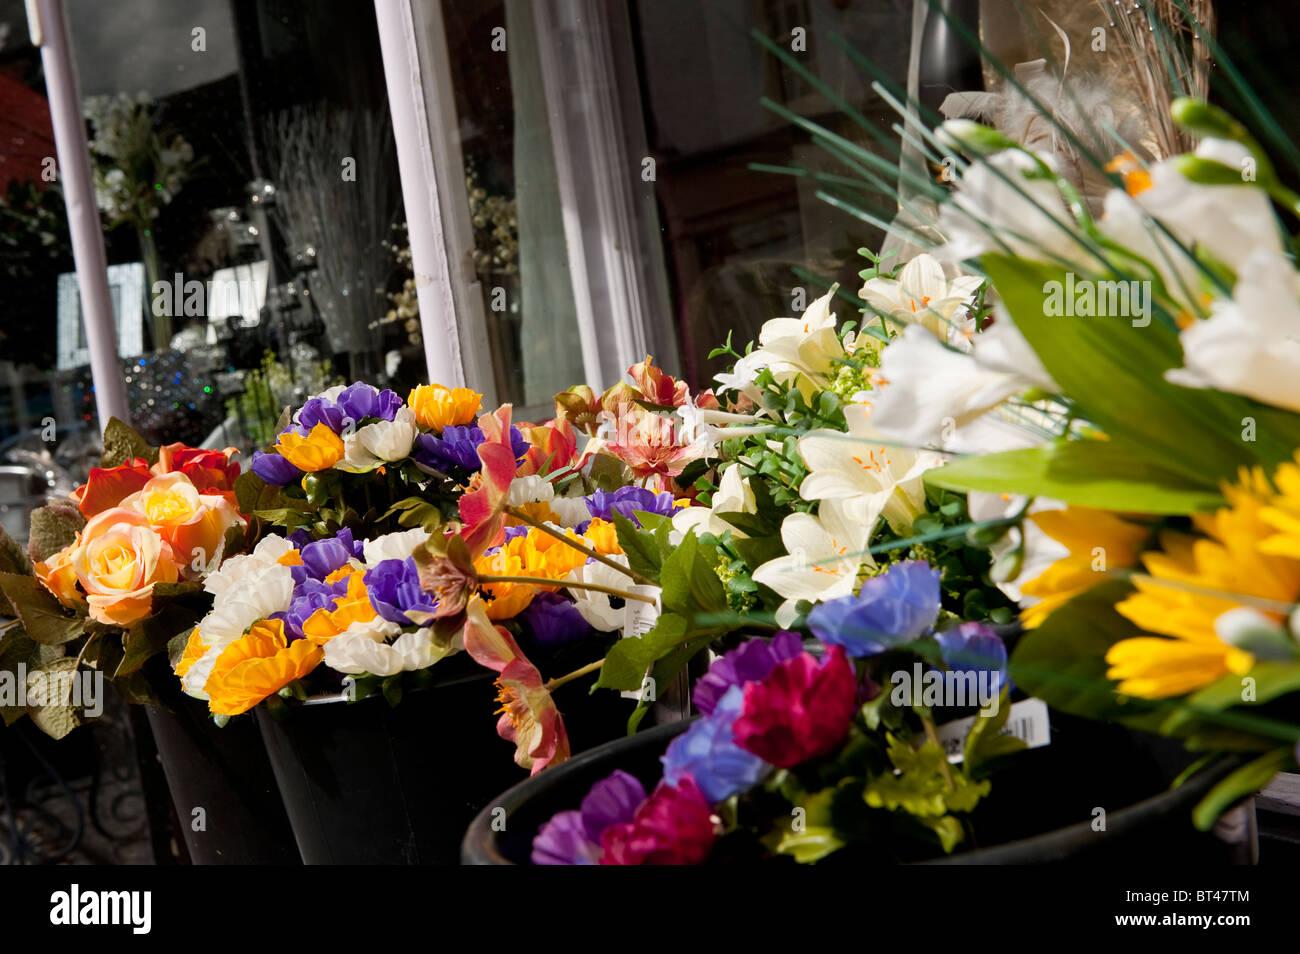 Beautiful display of silk flowers outside a florist shop in a town beautiful display of silk flowers outside a florist shop in a town in england mightylinksfo